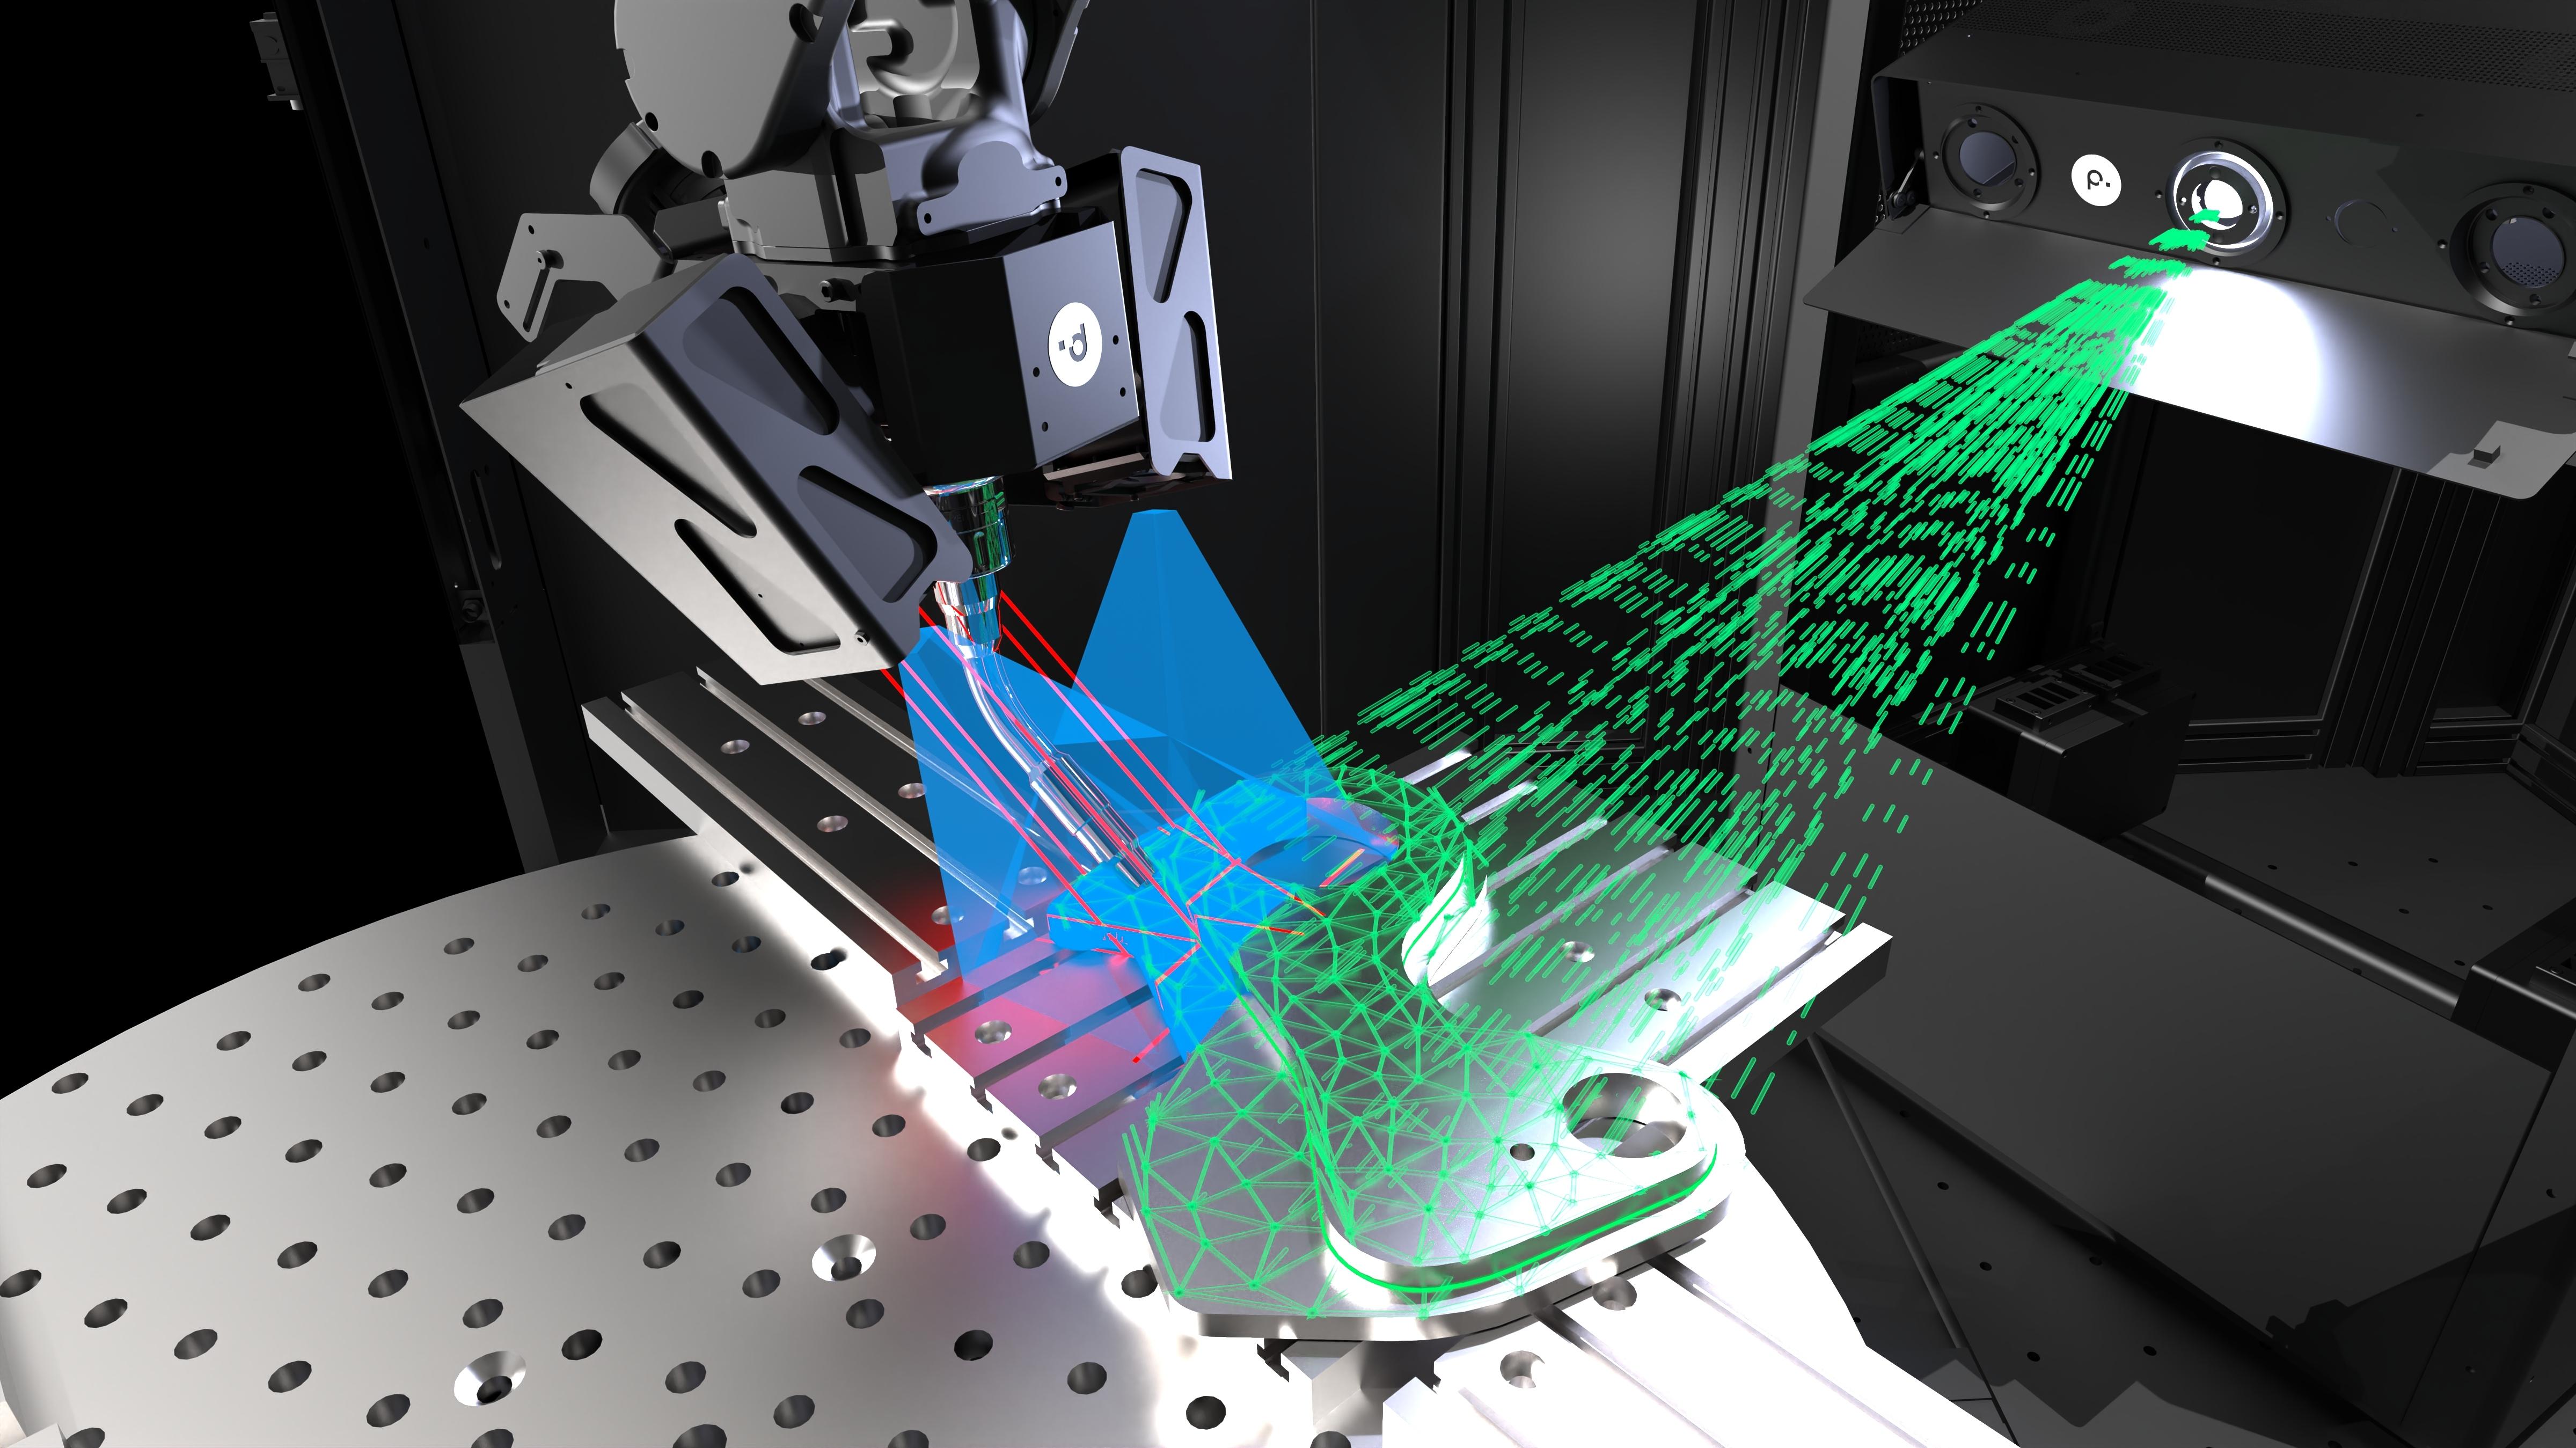 Path Robotics raises another $100M | TechCrunch